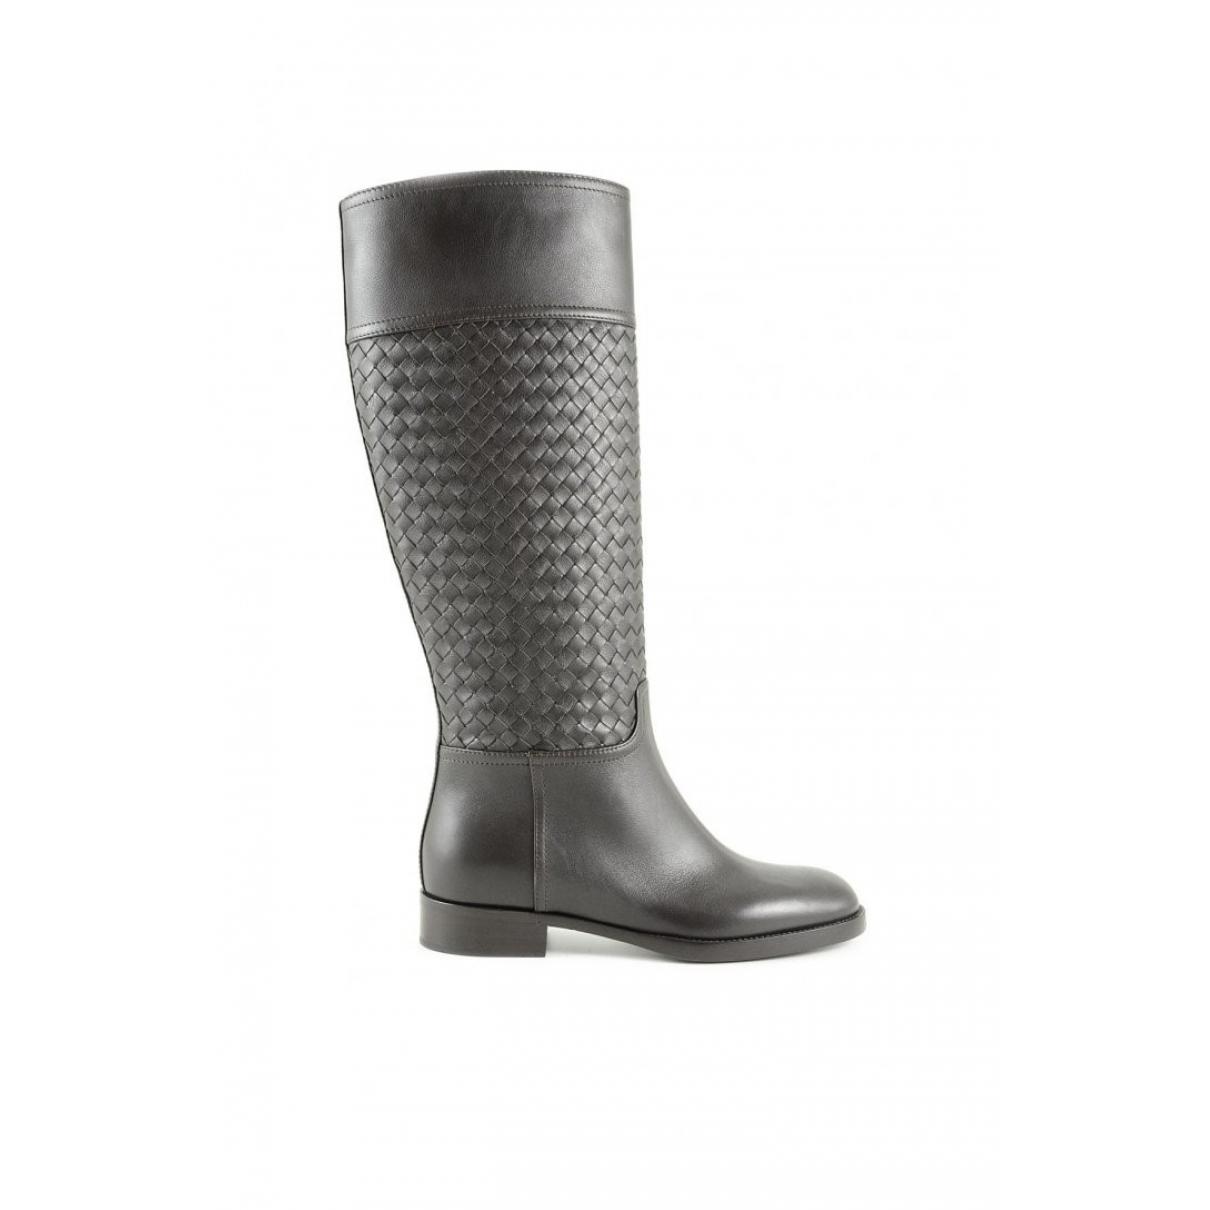 Bottega Veneta \N Black Leather Boots for Women 39 EU